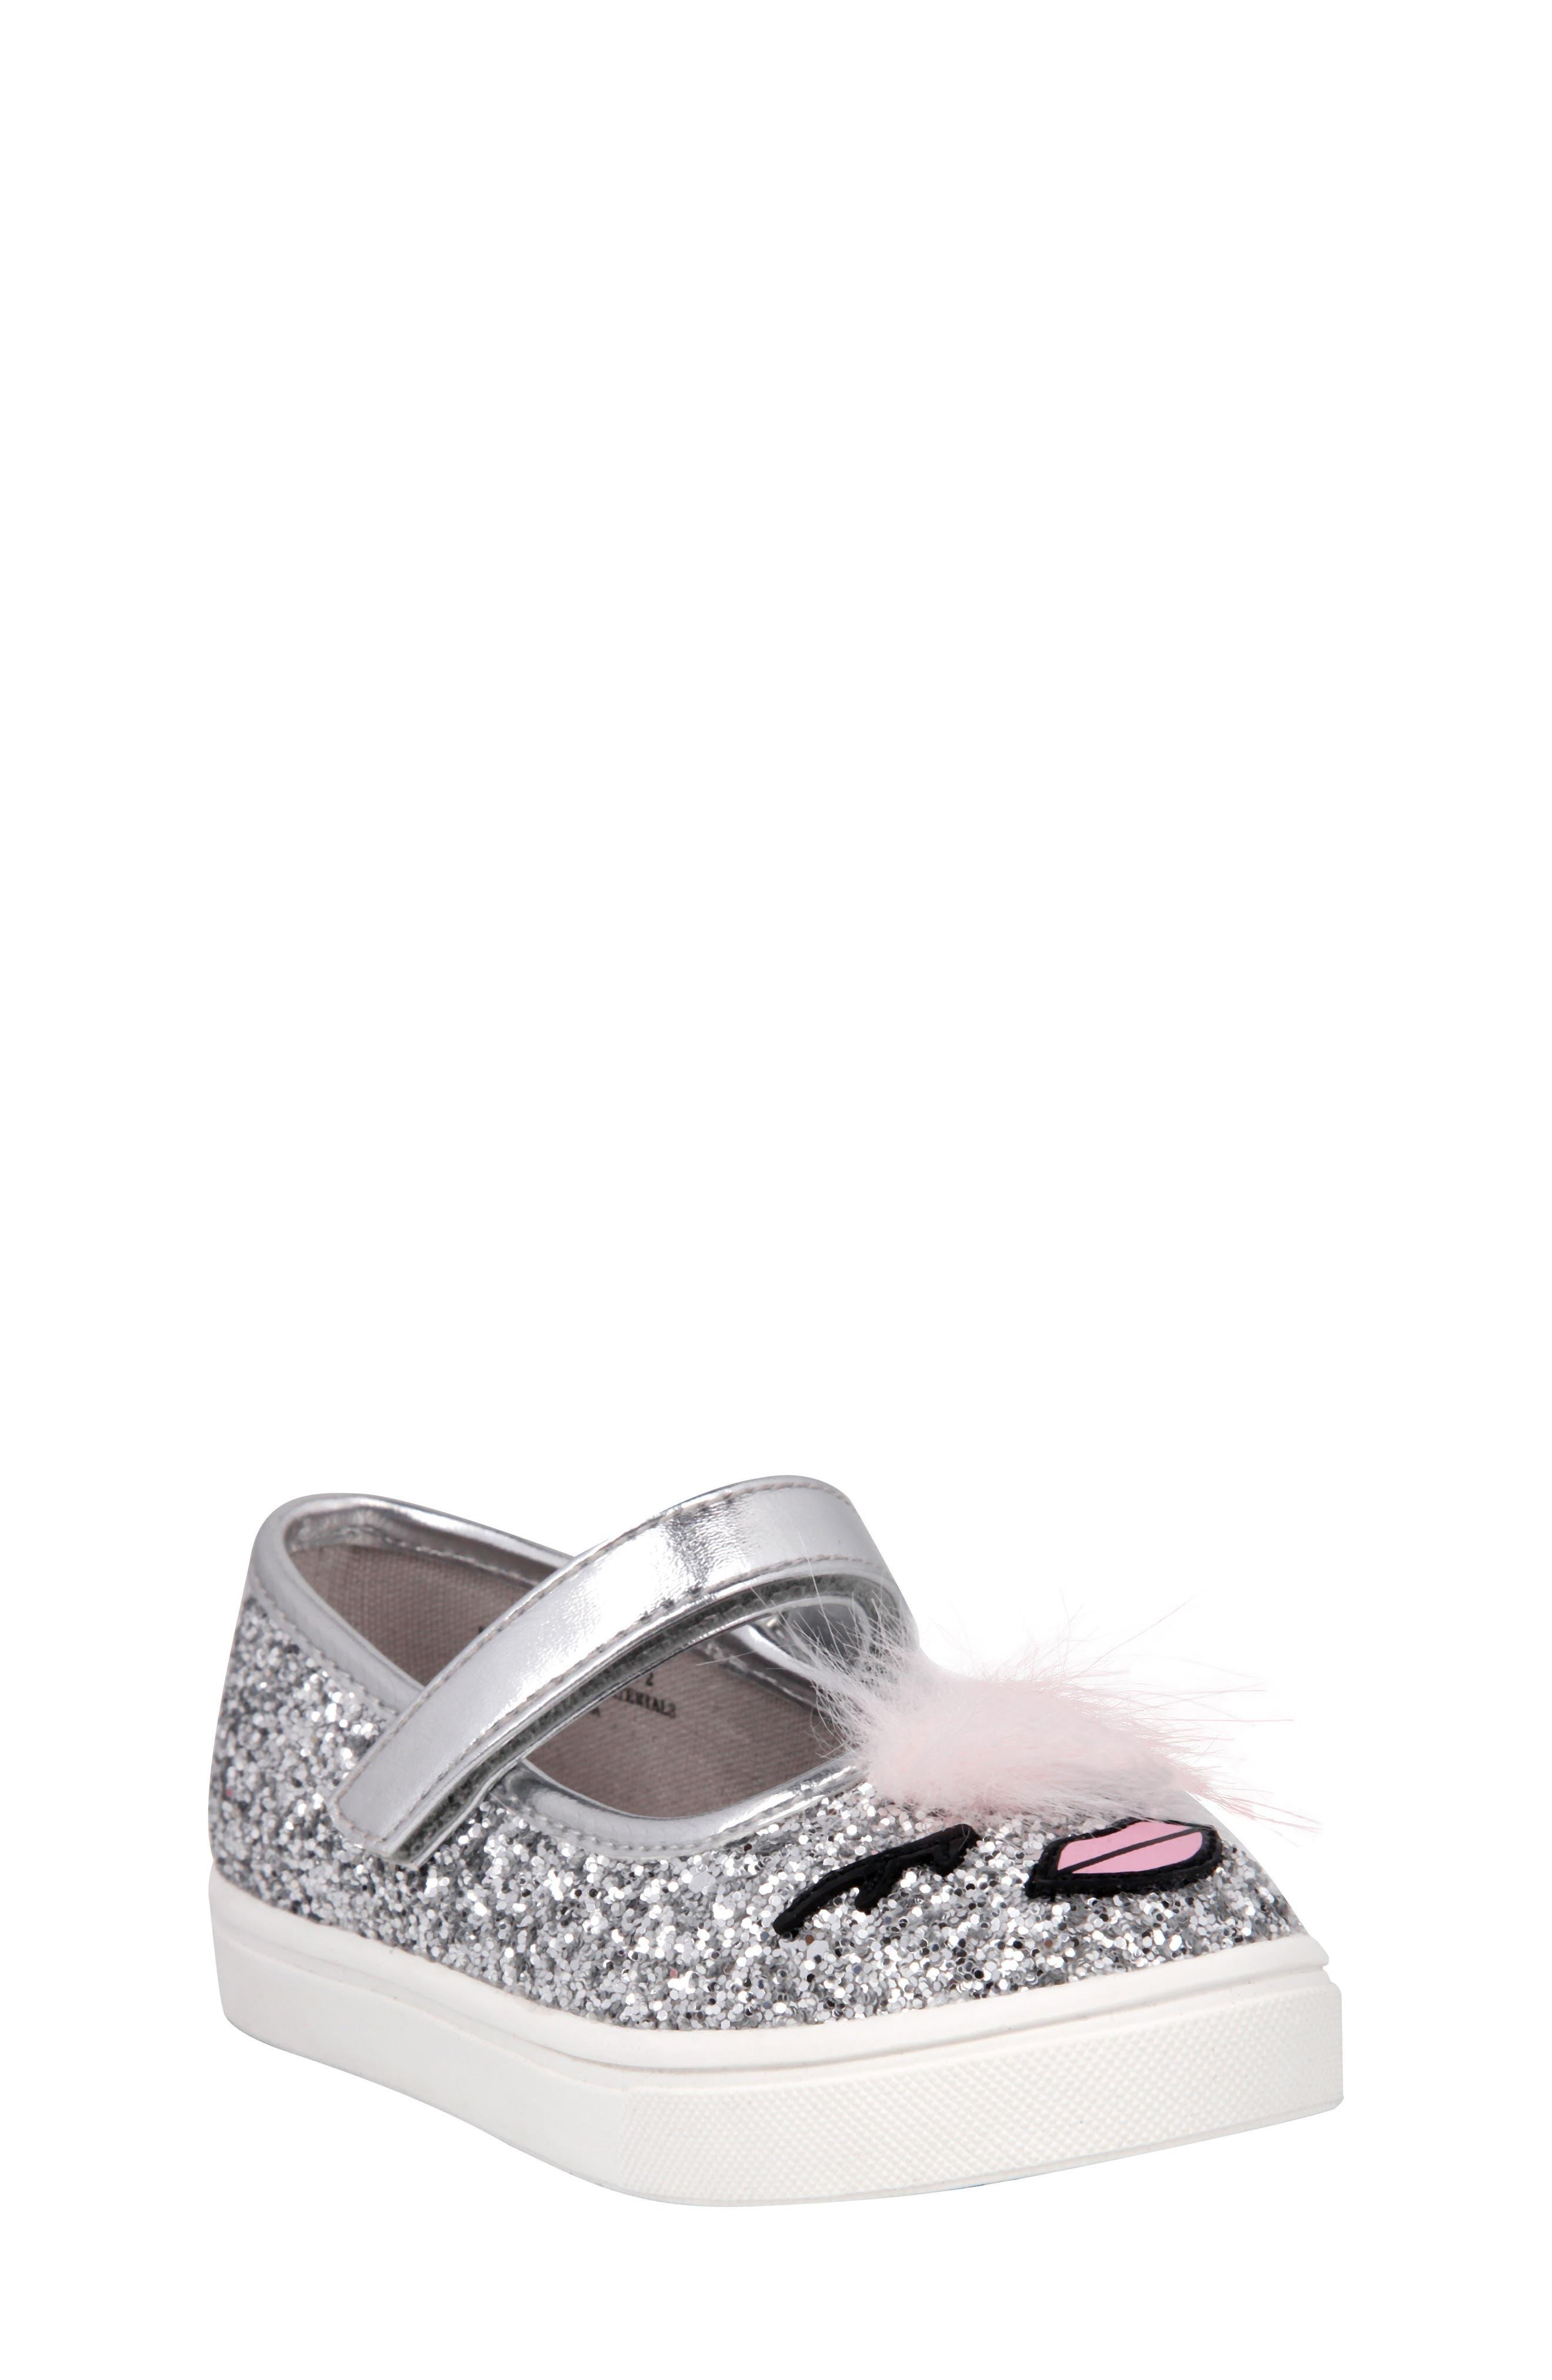 Ragina Faux Fur Glitter Mary Jane Sneaker,                             Main thumbnail 1, color,                             046